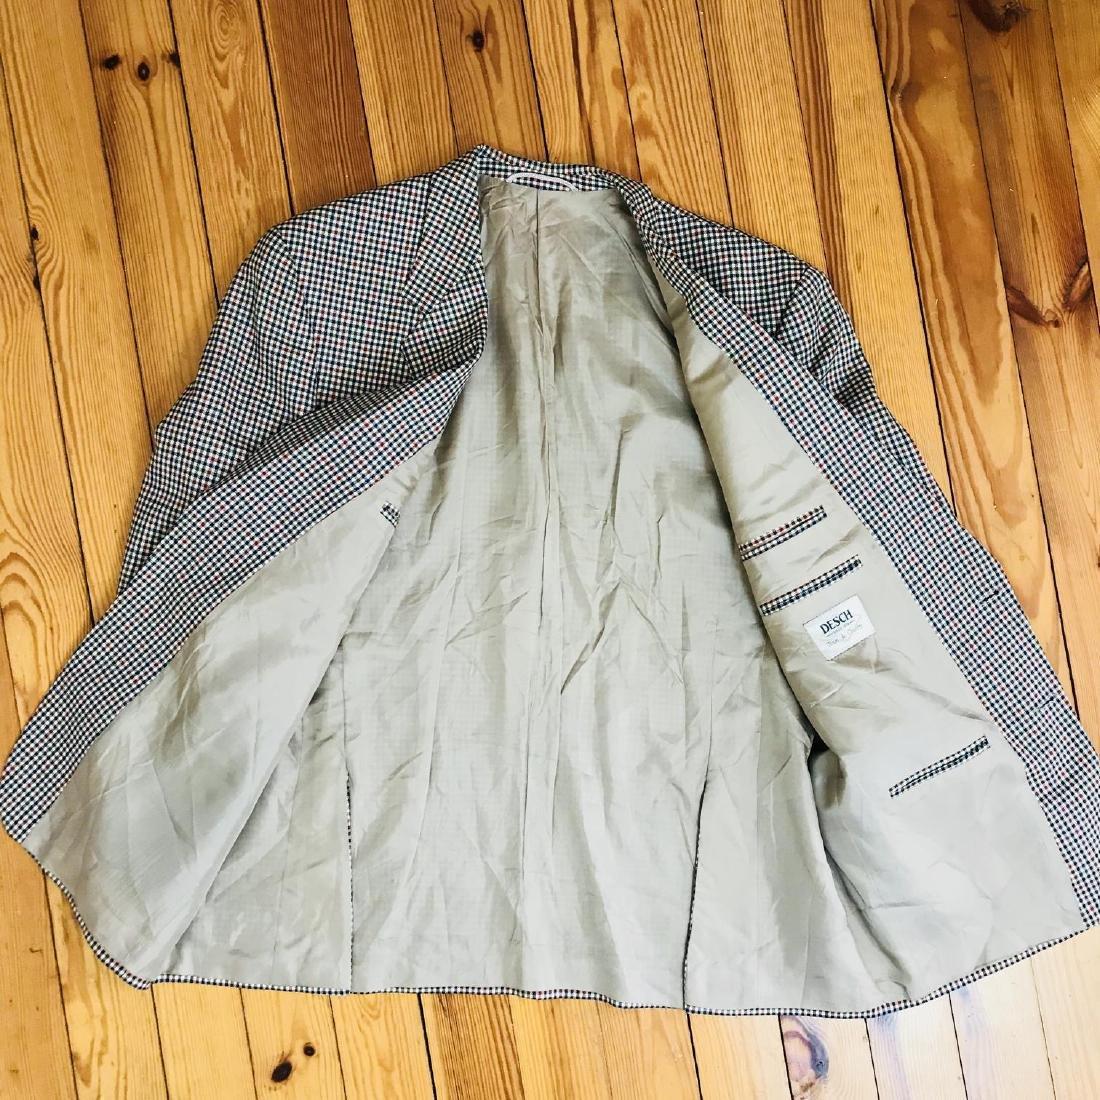 Vintage Men's DESCH Jacket Blazer Size US 46 SHORT - 5